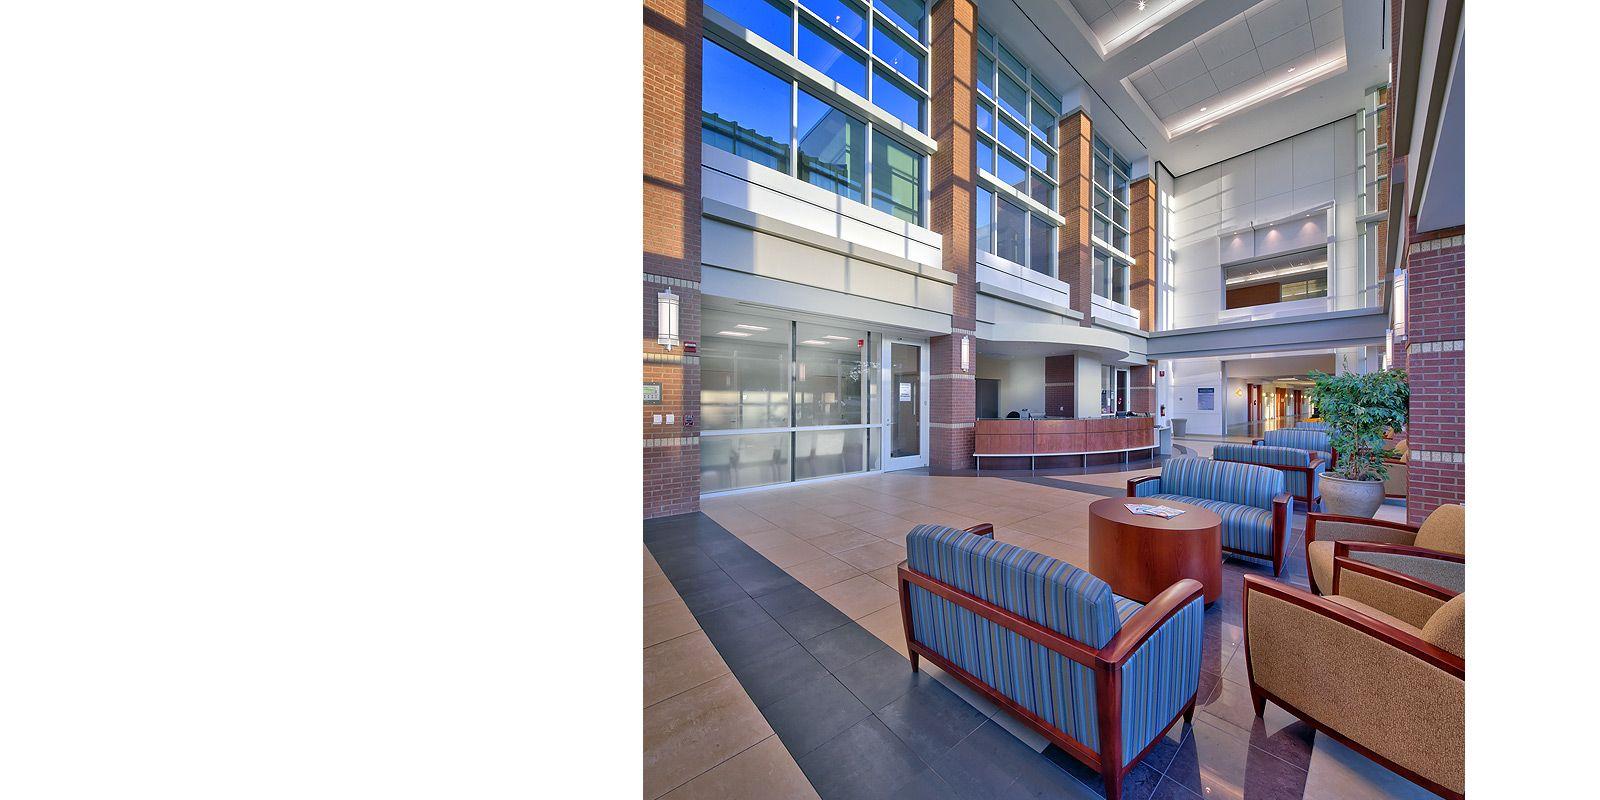 Methodist Germantown brg3s architects Architect